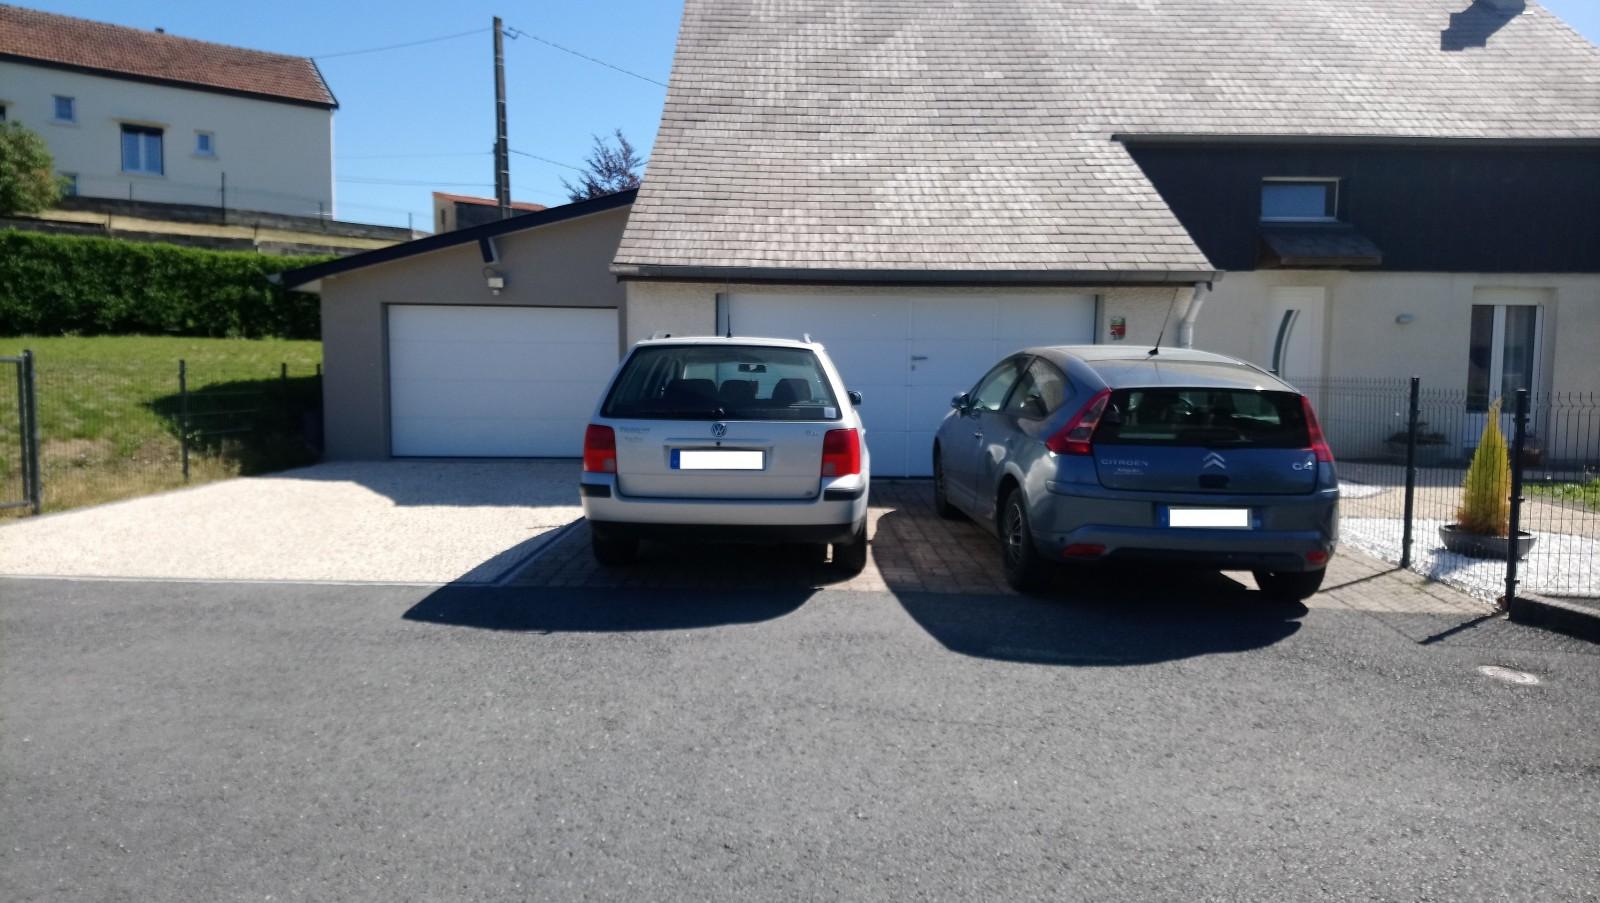 Votre garage parking box en photos page 2 forum ma bmw for Garage recuperer voiture